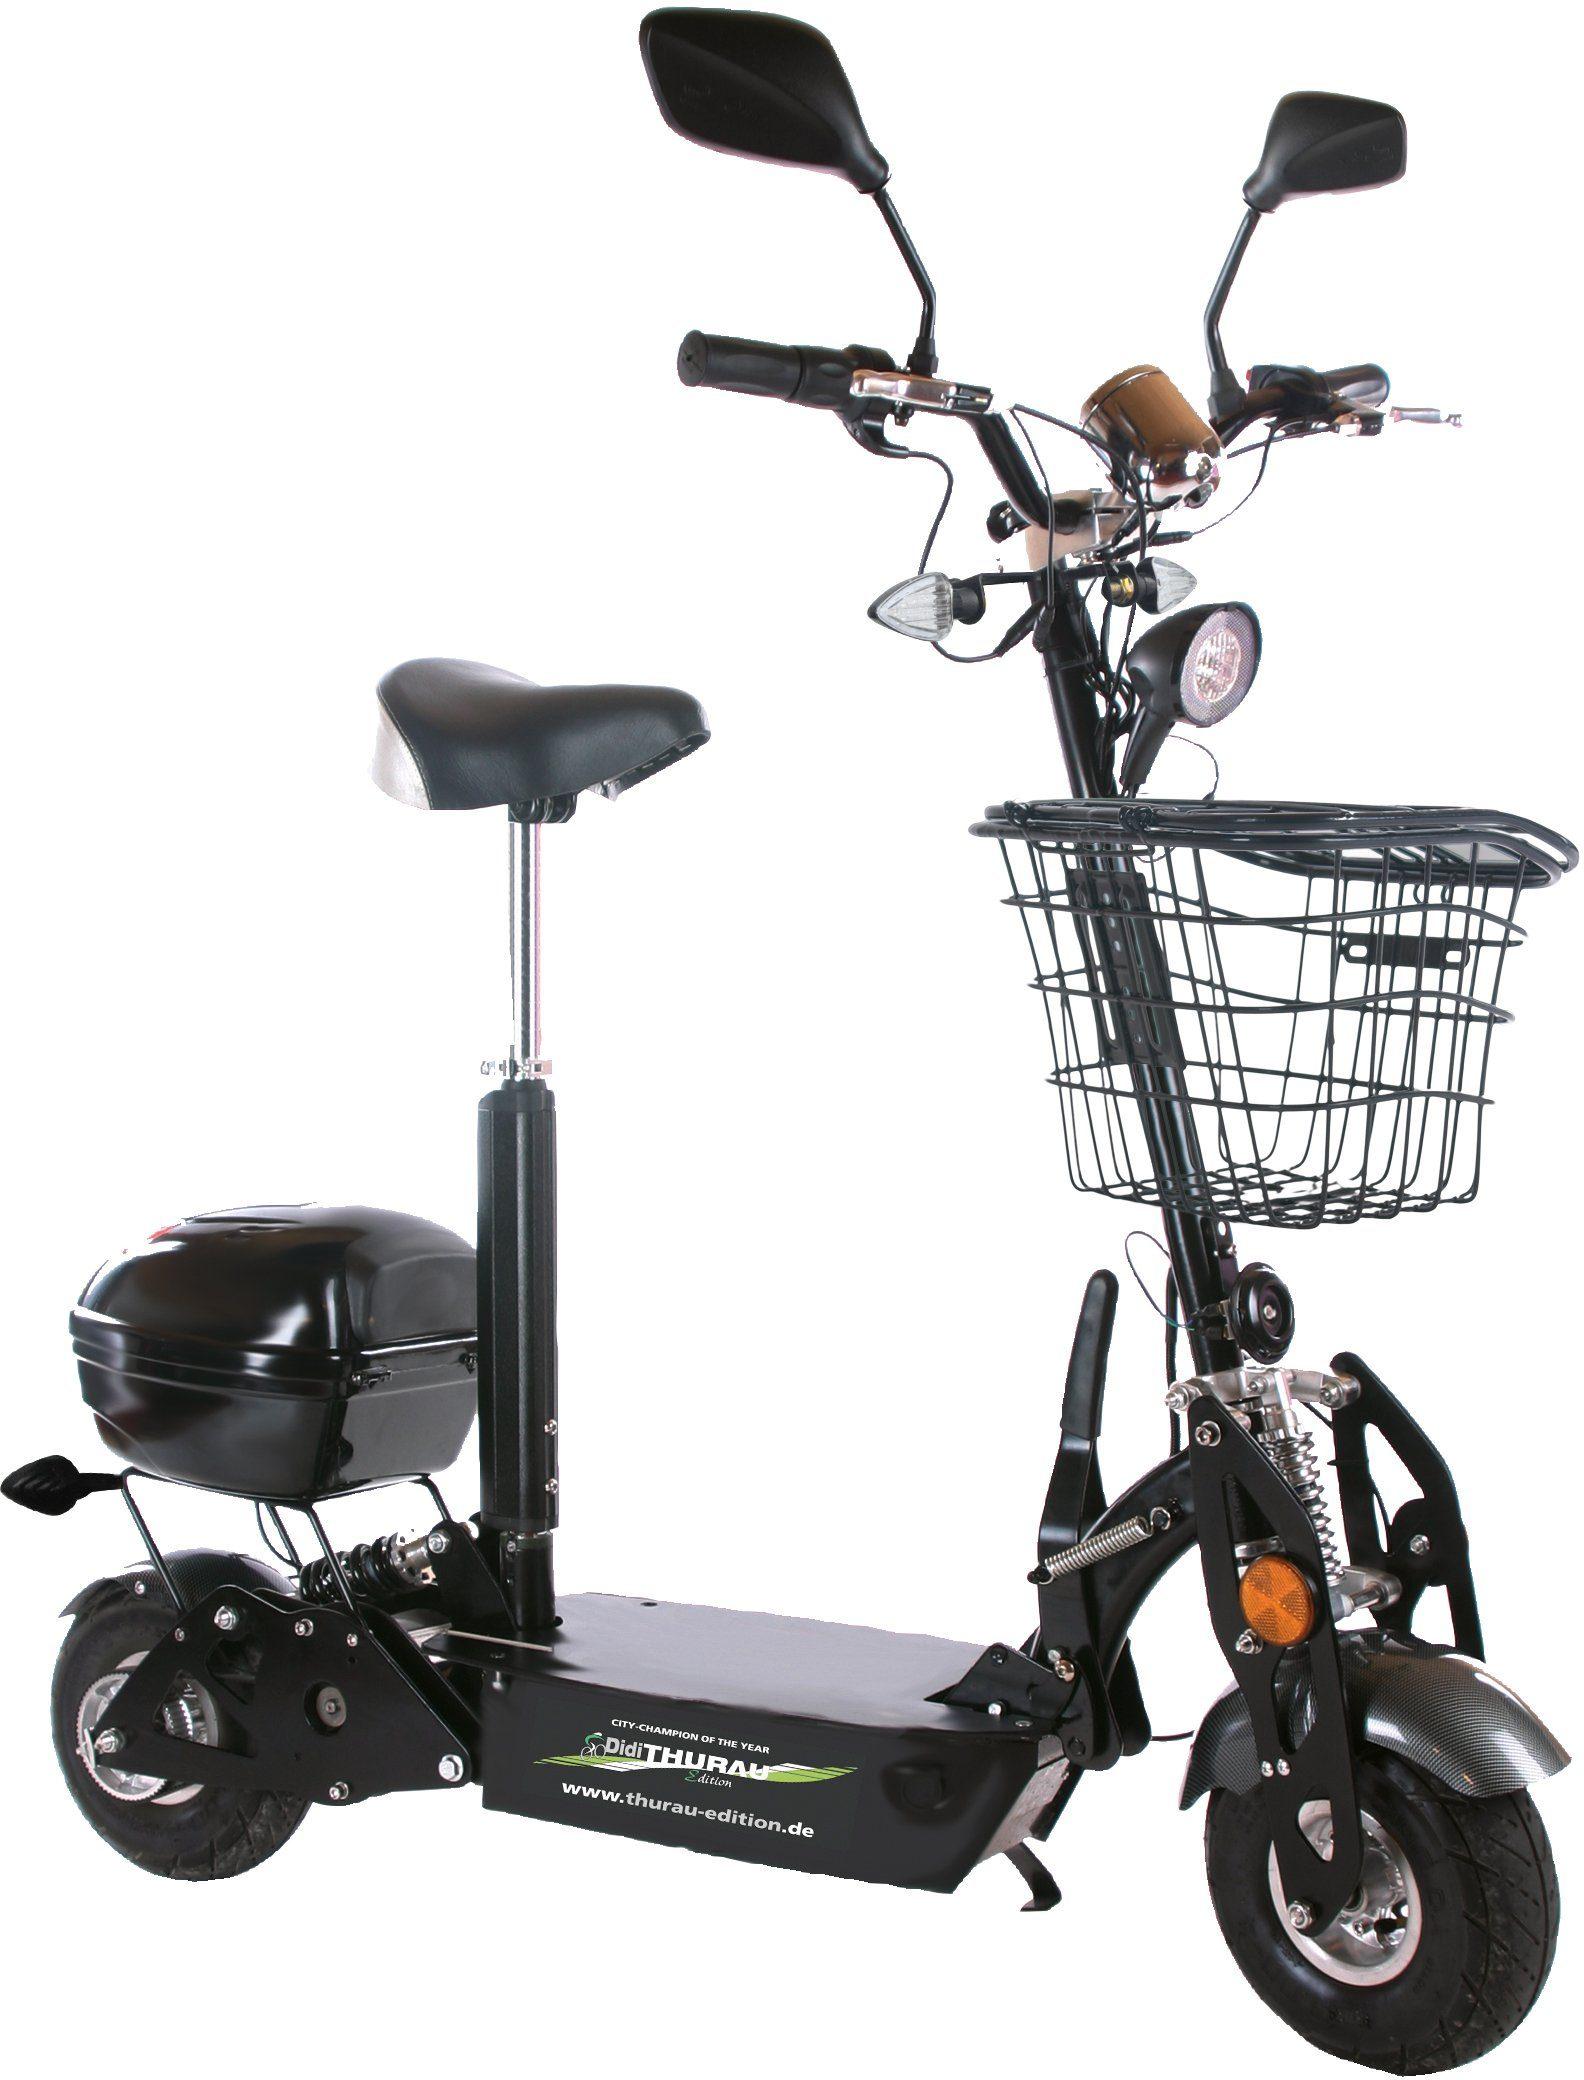 Didi Thurau Edition Elektro City Roller, 20 km/h, »Safety Plus«